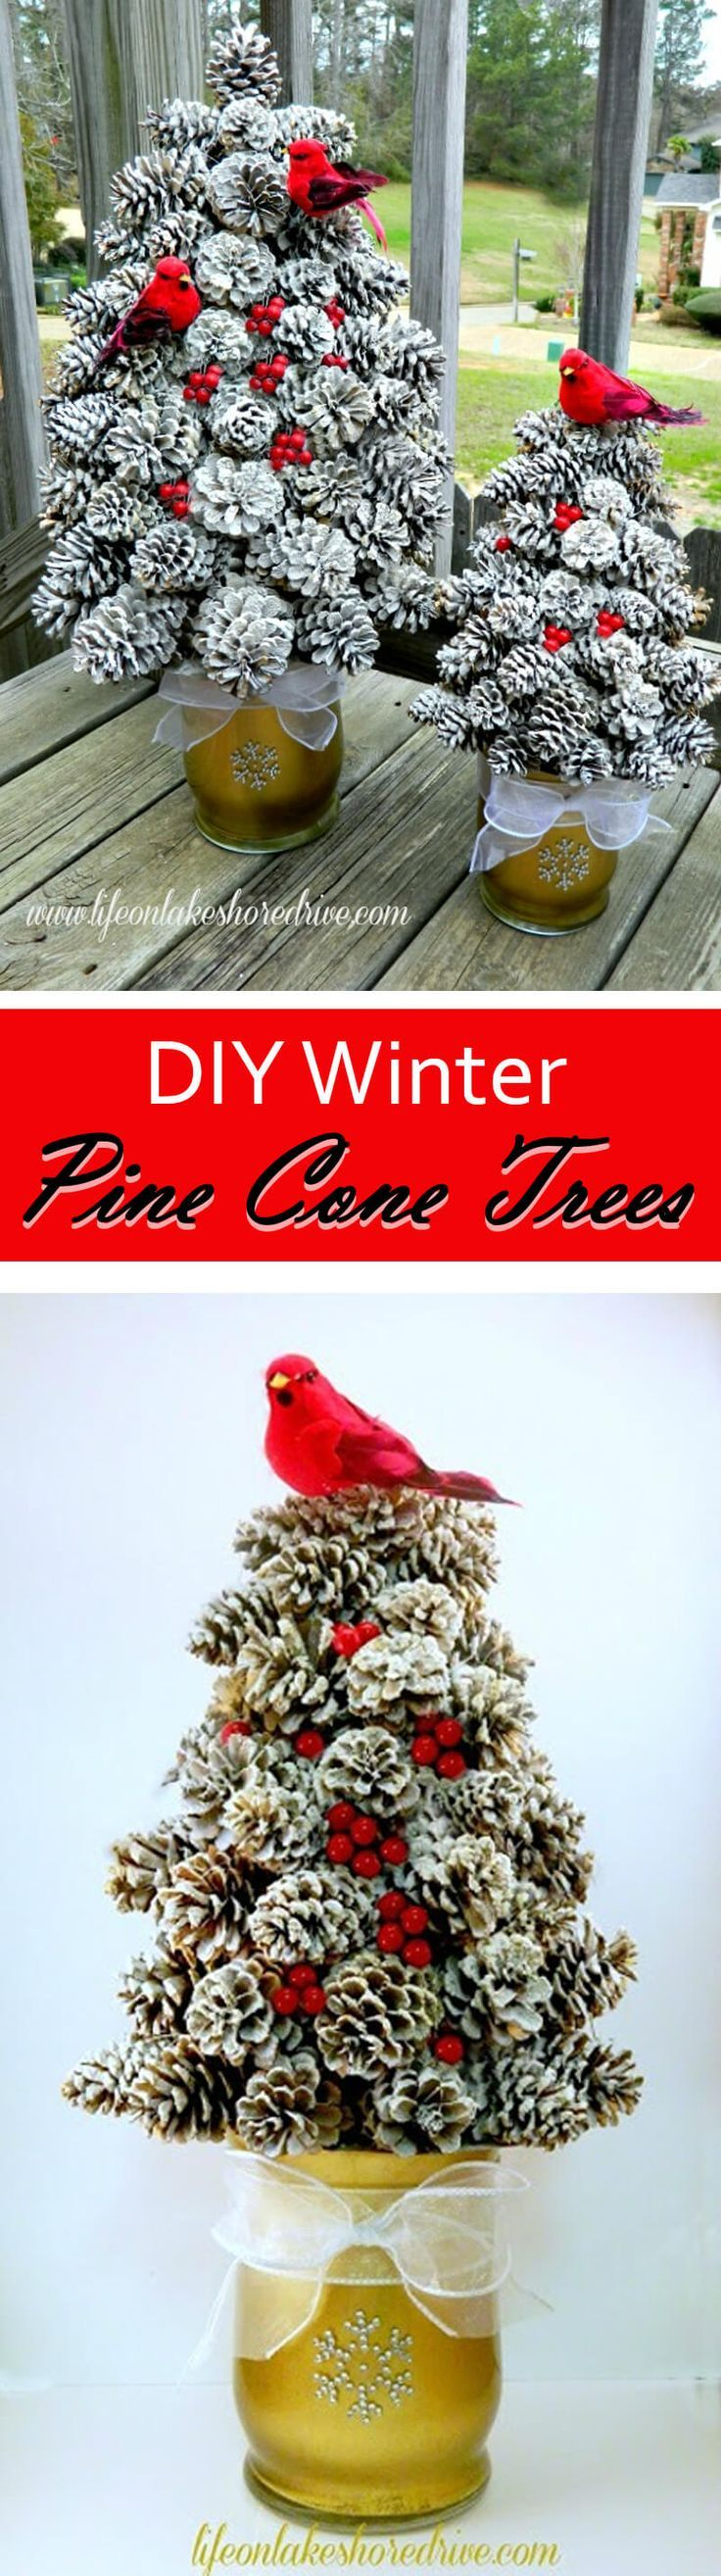 362 best Christmas Home Decor images on Pinterest